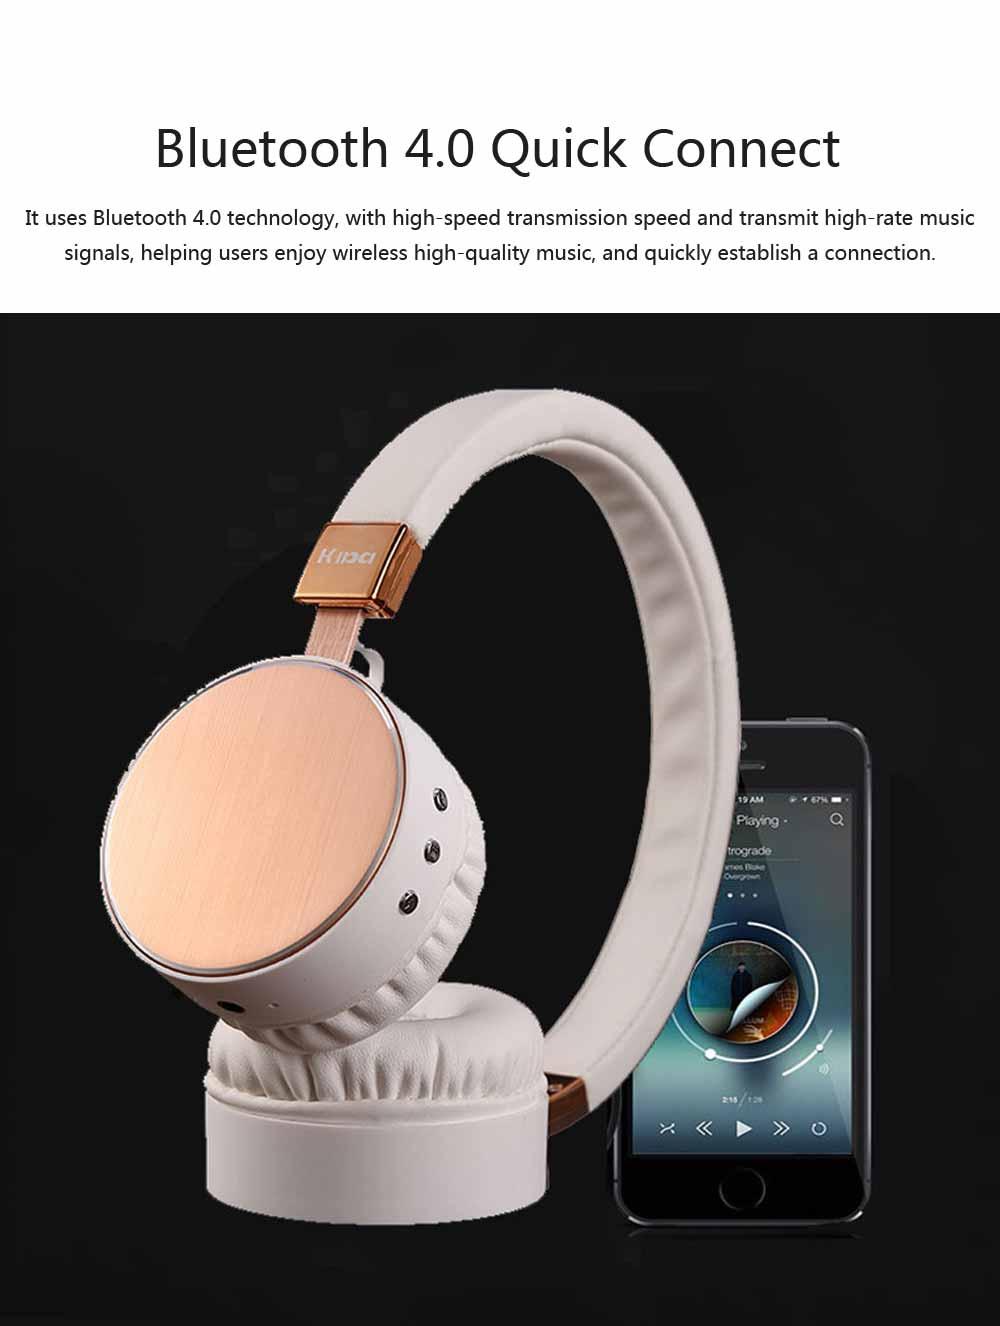 Headset Subwoofer Wireless Bluetooth Headphones Smart Stereo Sports Phone Headset, Universal Mini Headset Gaming Bluetooth Earphone 4